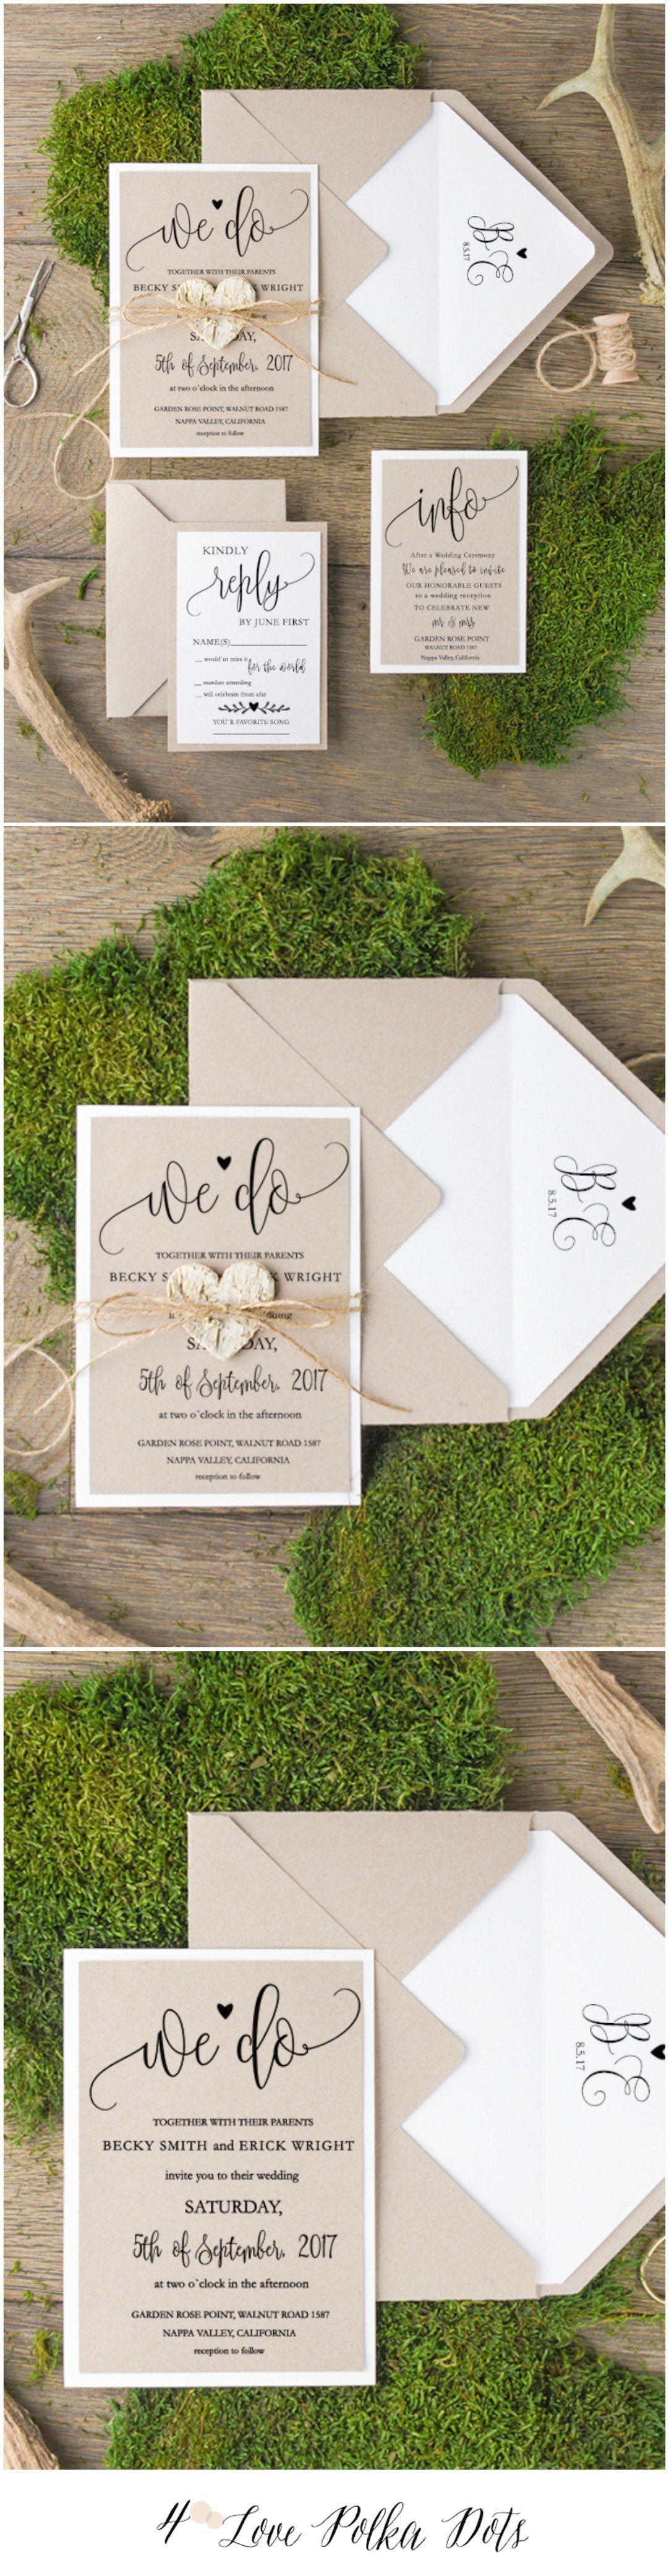 Traditional Wedding Invitation Templates Free Download Unique